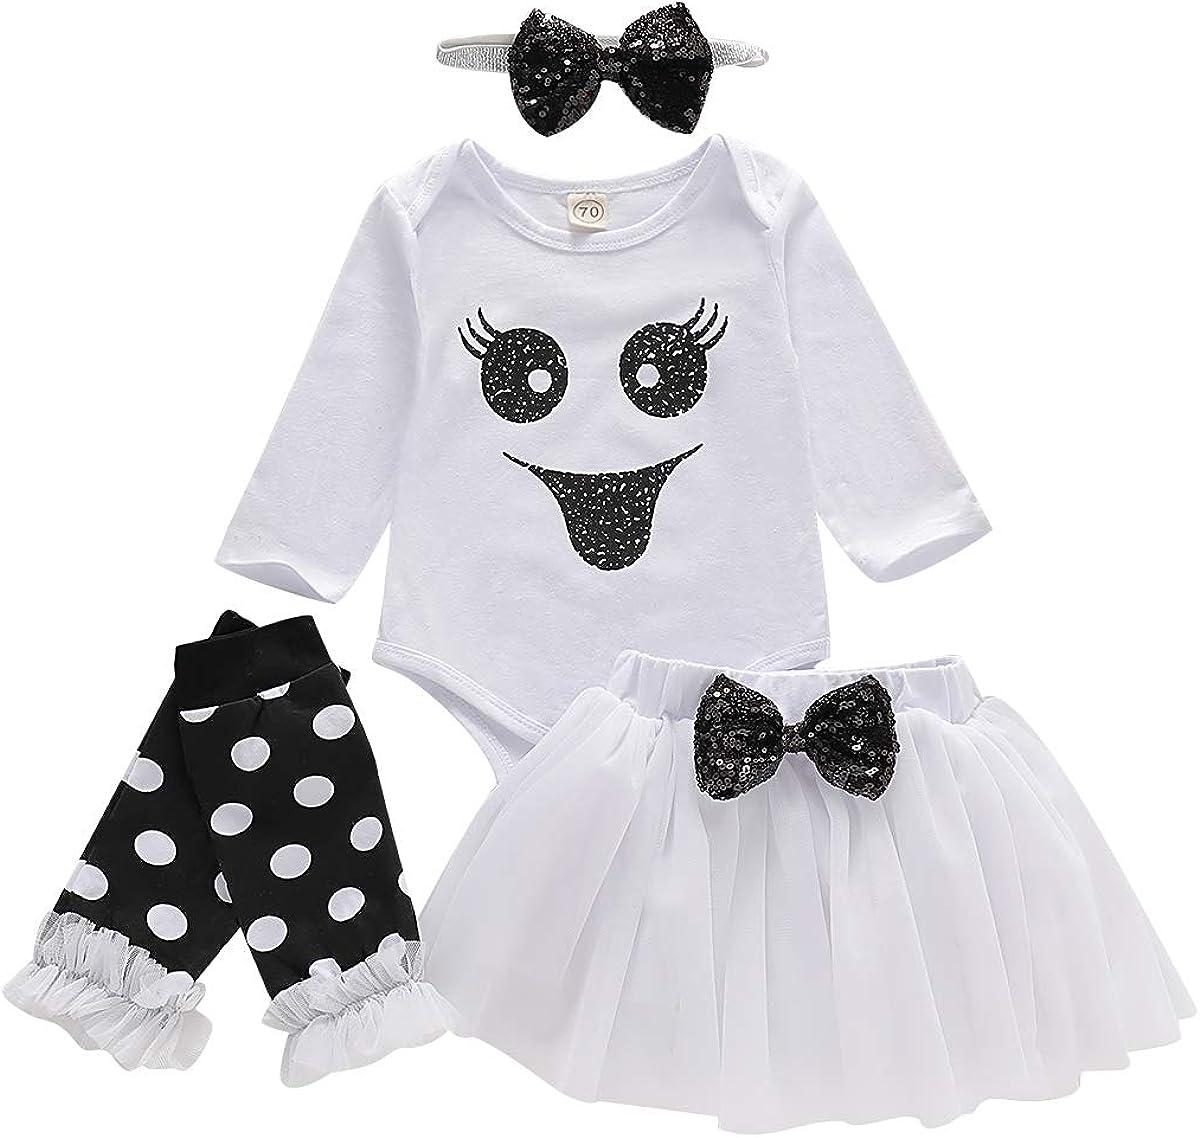 GRNSHTS Baby Girls Halloween Outfits Toddler Ghost Long Sleeve Romper+Tutu Skirt+Bowknot Headband+Leg Warmer 4Pcs Clothes